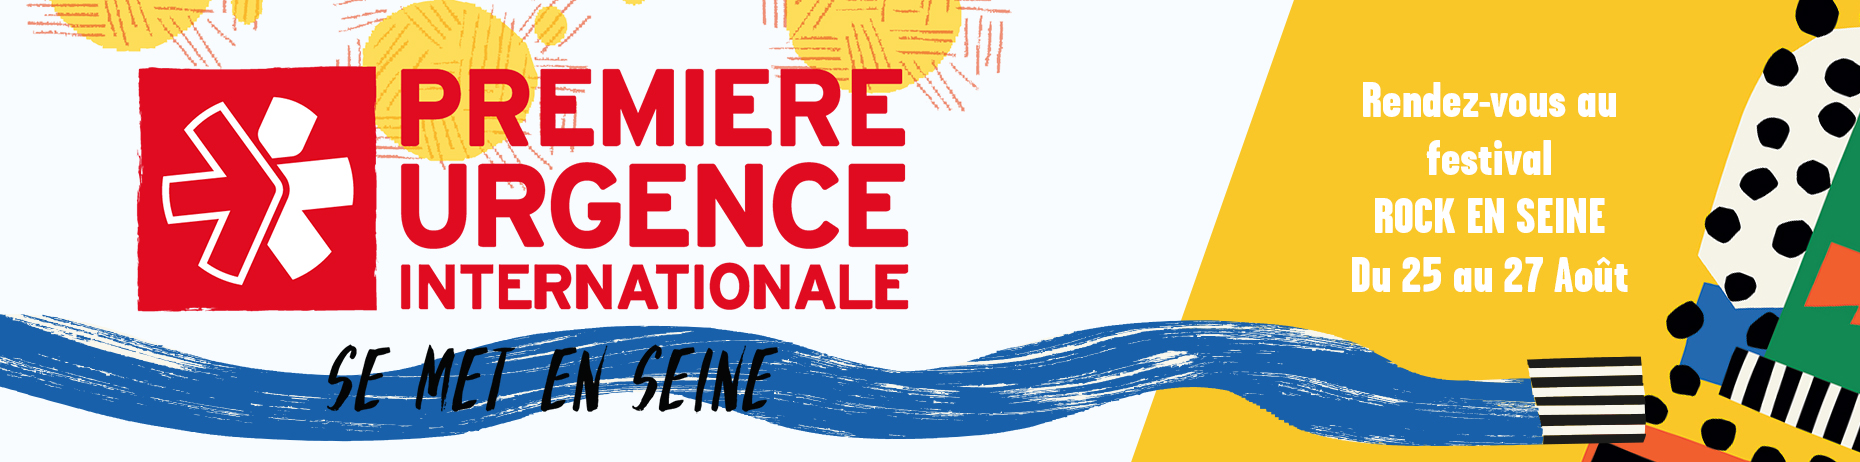 Première Urgence Internationale se met en Seine, à Rock-en-Seine